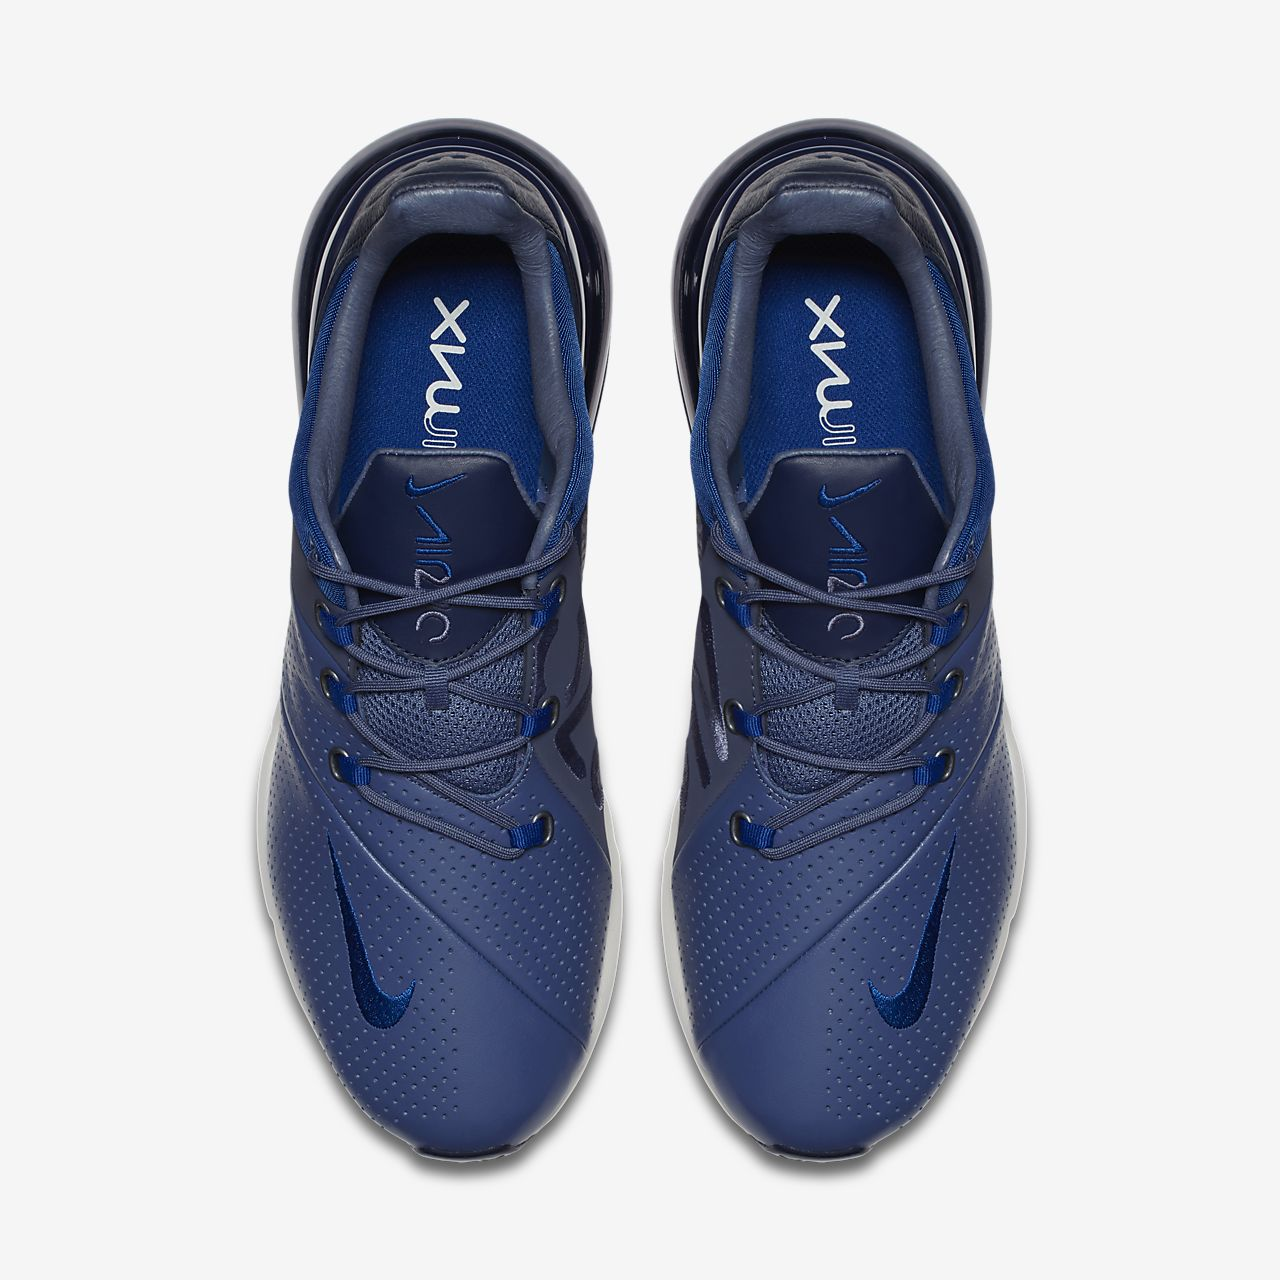 fa3caa600620 Nike Air Max 270 Premium Men s Shoe. Nike.com